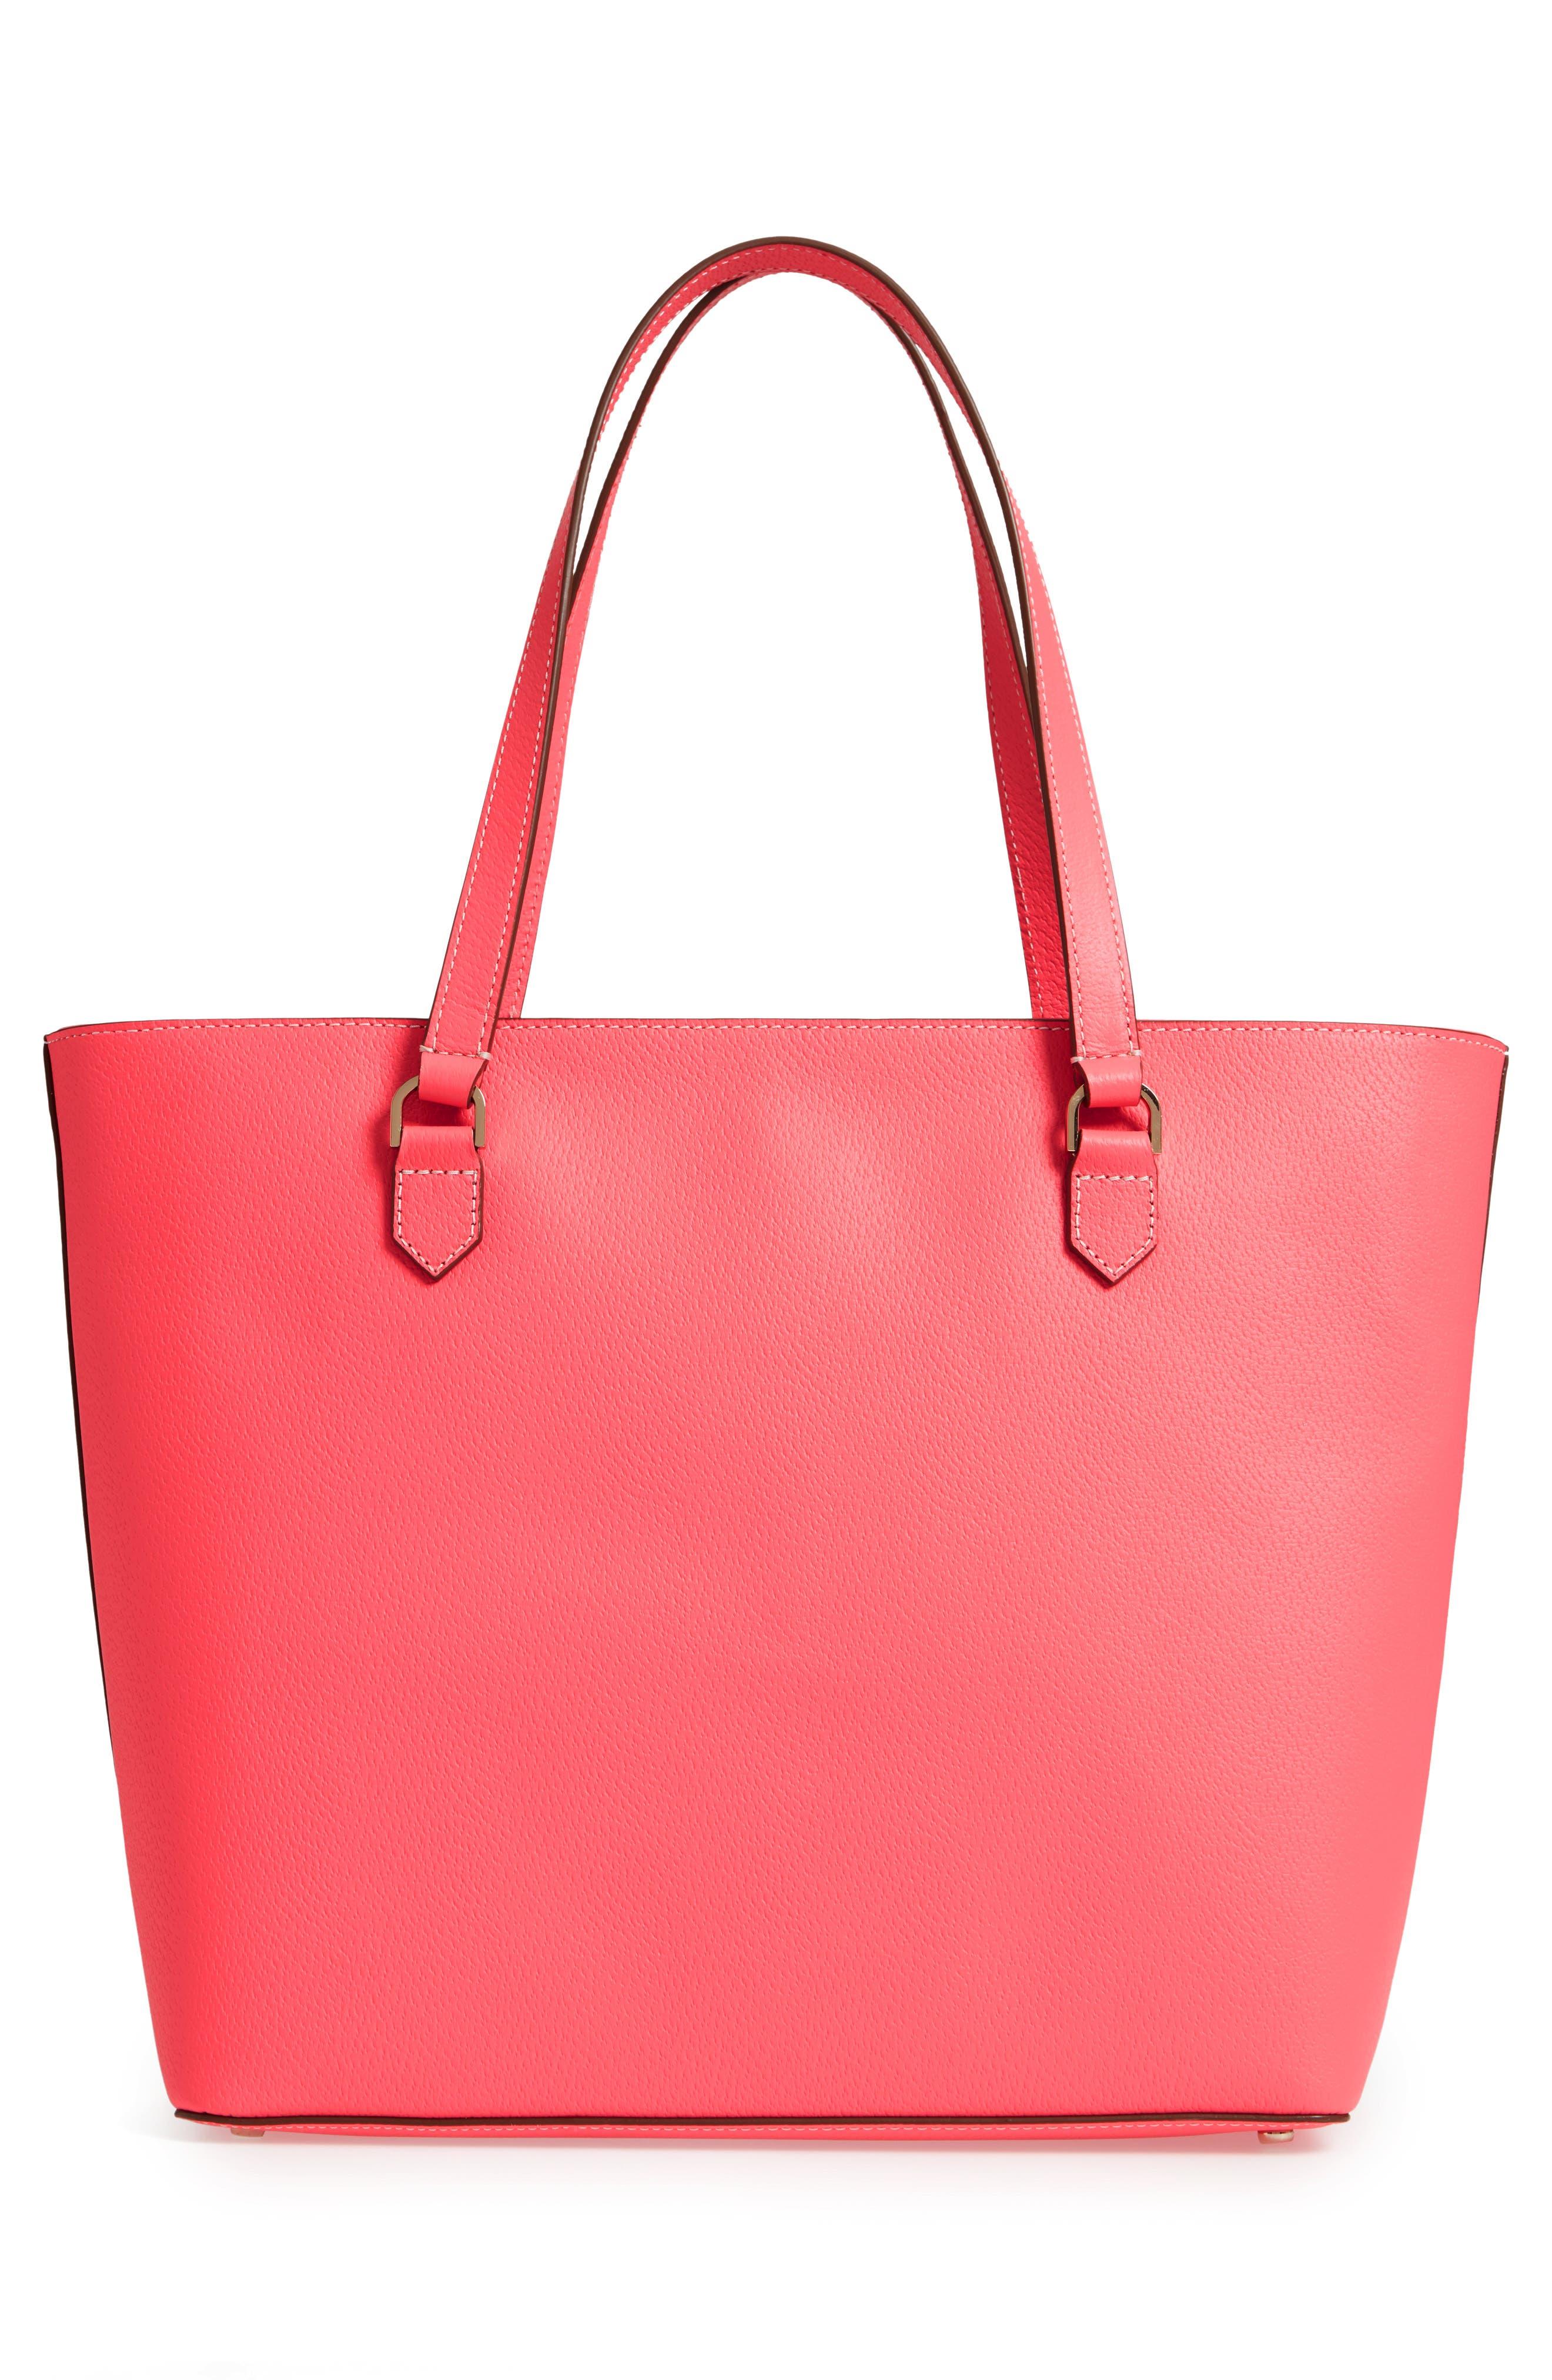 thompson street - kimberly leather tote,                             Alternate thumbnail 3, color,                             Bright Flamingo